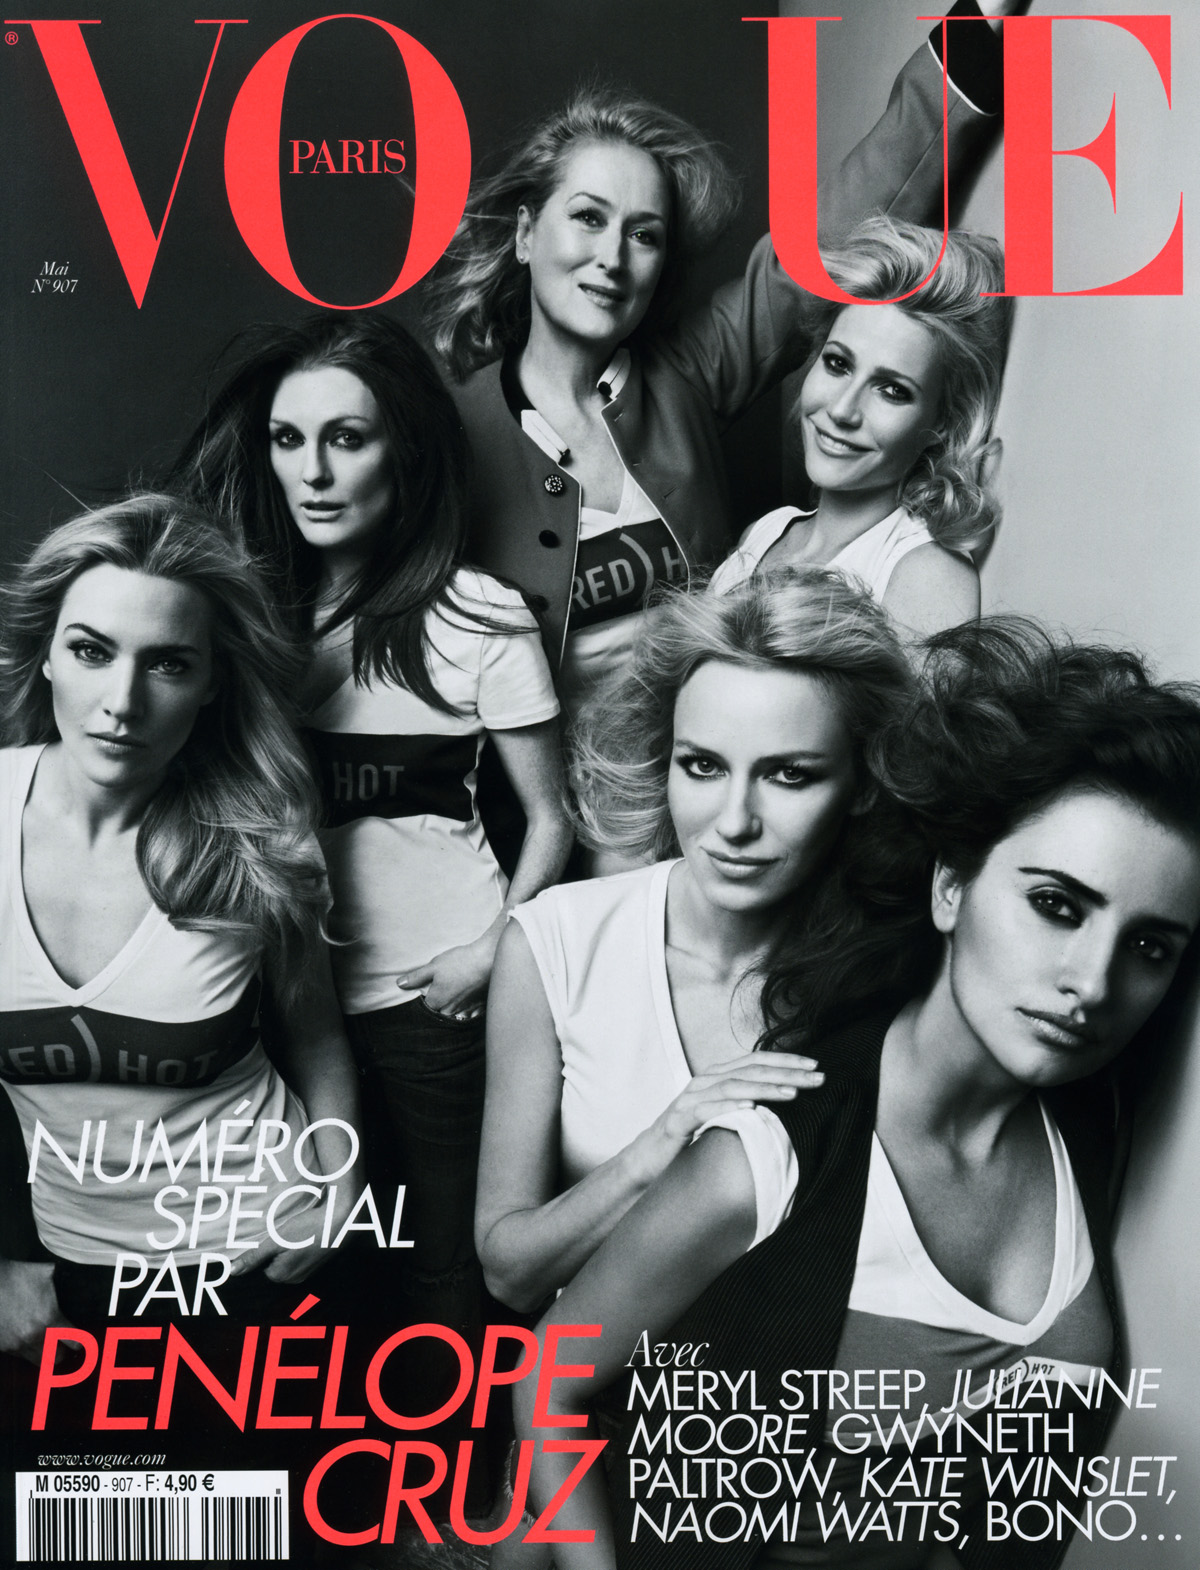 http://2.bp.blogspot.com/_eg2I5vDRaWM/S-DwAm1F2NI/AAAAAAAAK_Q/RunXt95JgvI/s1600/Vogue+Paris+-+Pen%C3%A9lope,+Naomi,+Gwyneth,+Meryl,+Julianne+%26+Kate+by+I%26V.jpg